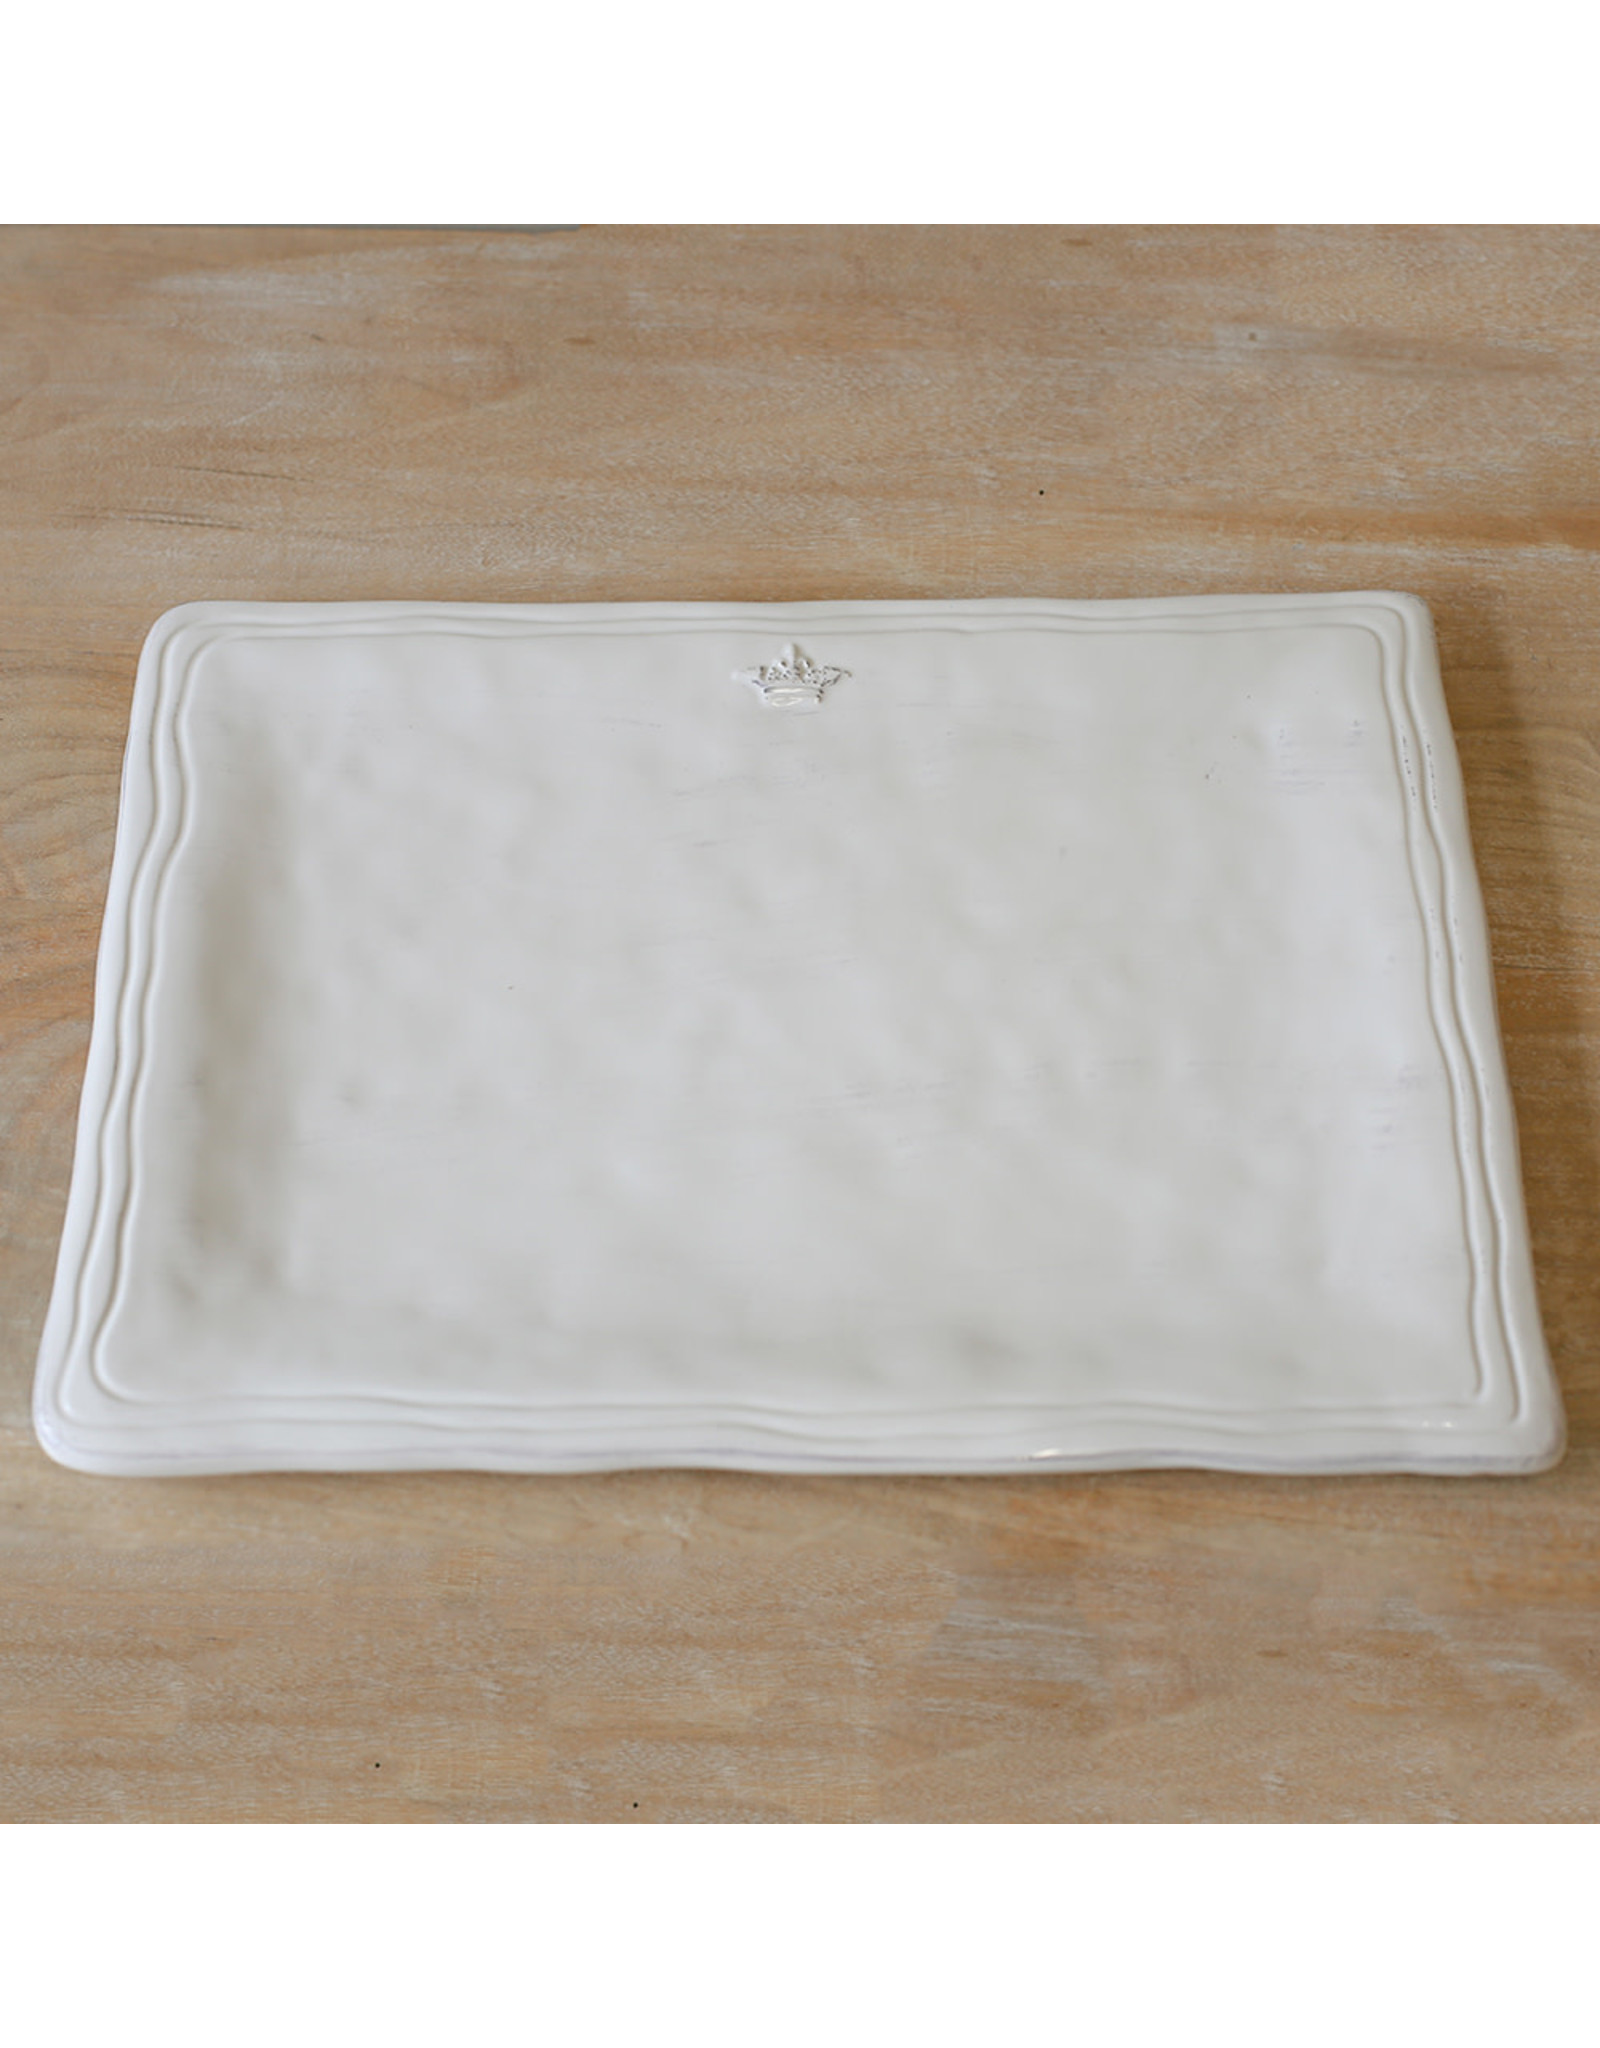 The Royal Standard Antique White Crown Platter, 15.5 x 11